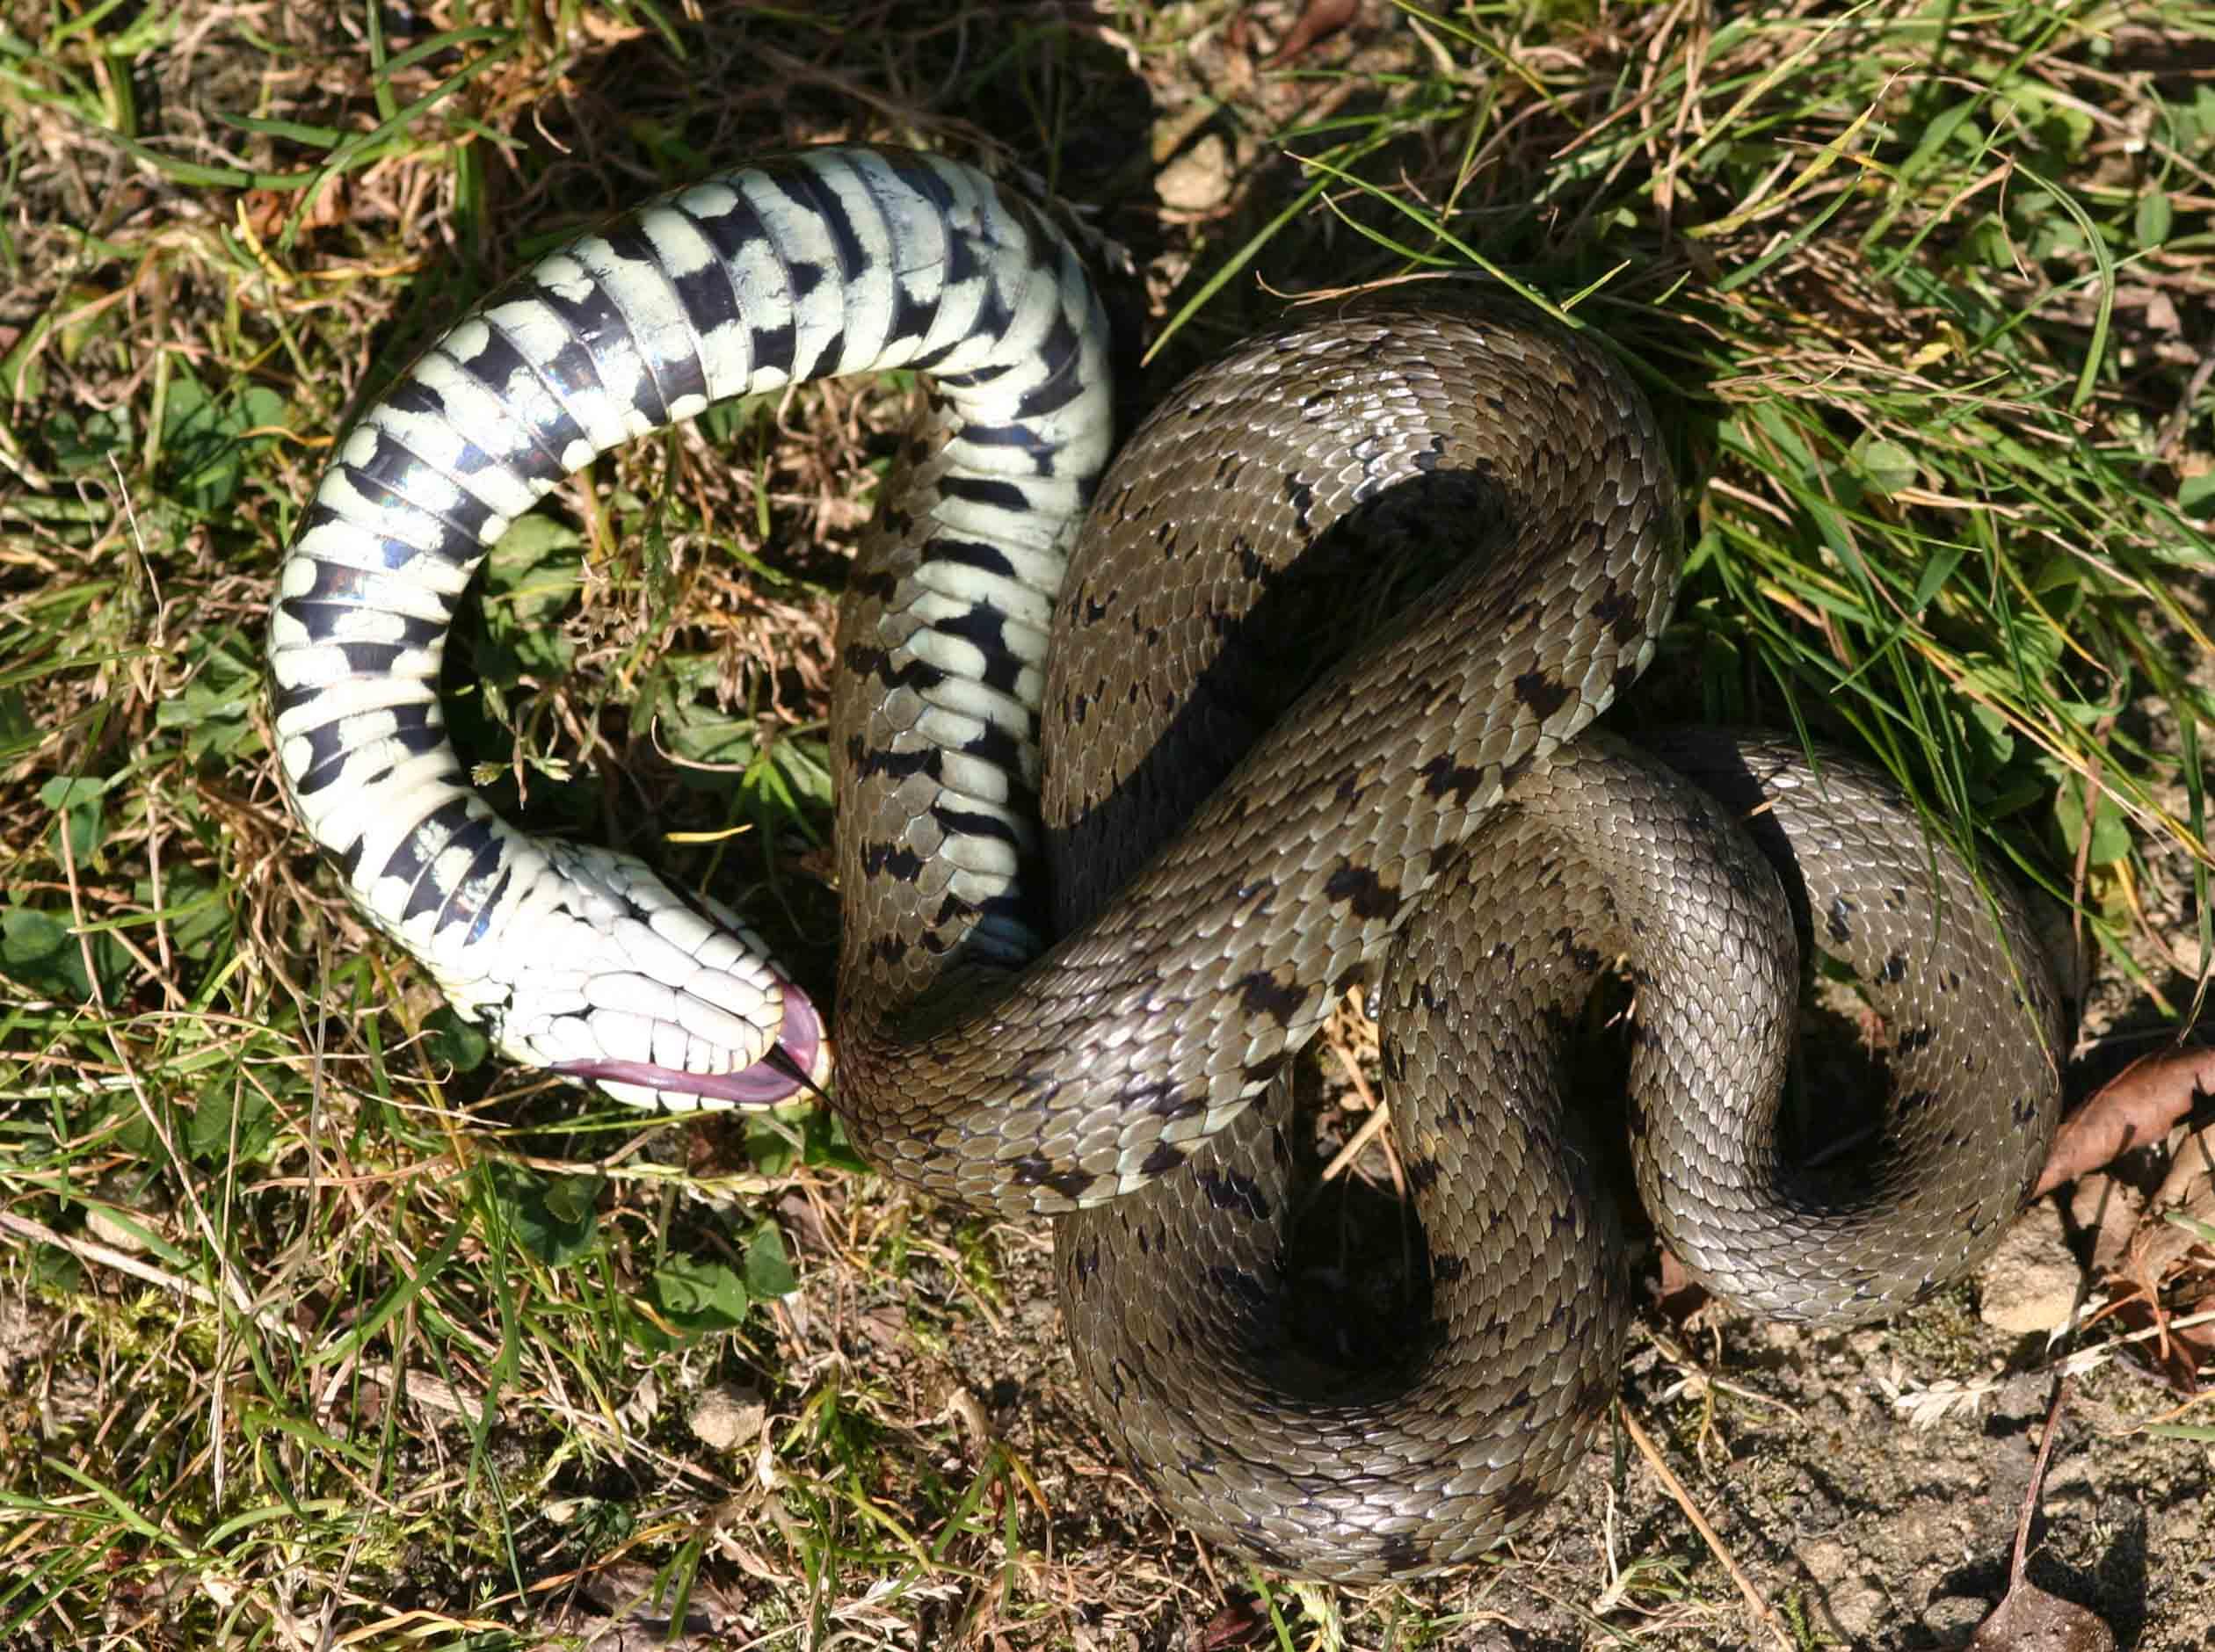 Grass snake (Natrix natrix) feigning death